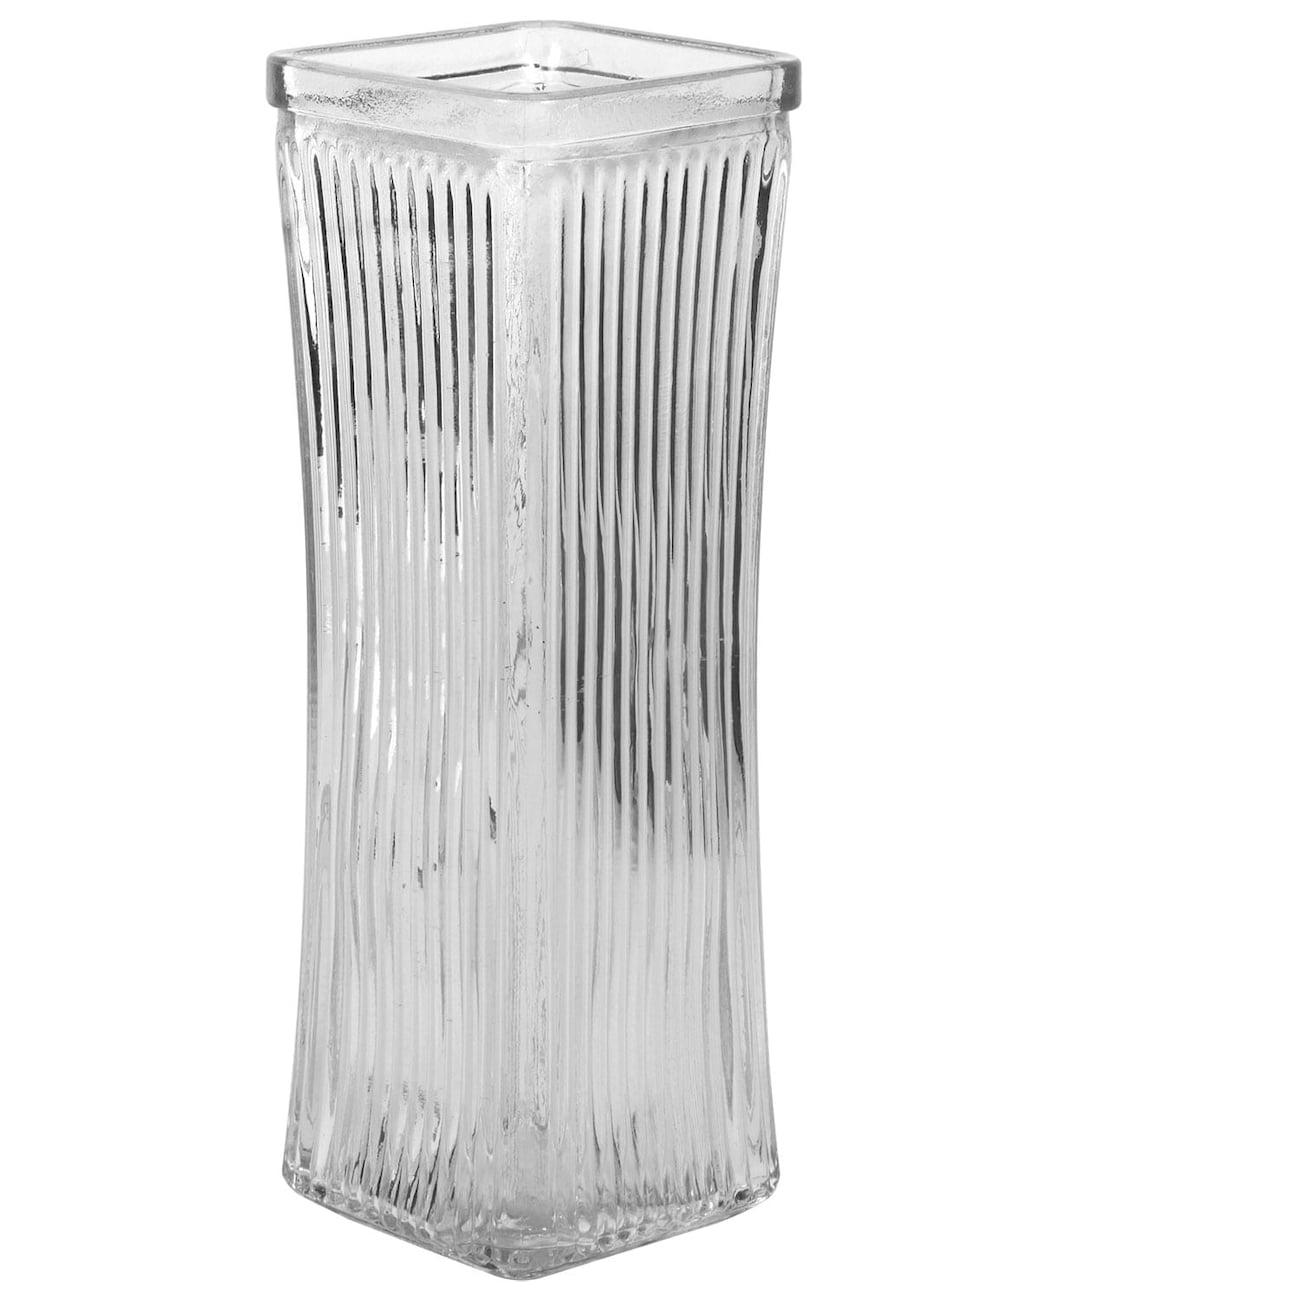 Glass Vases Dollar Tree Inc